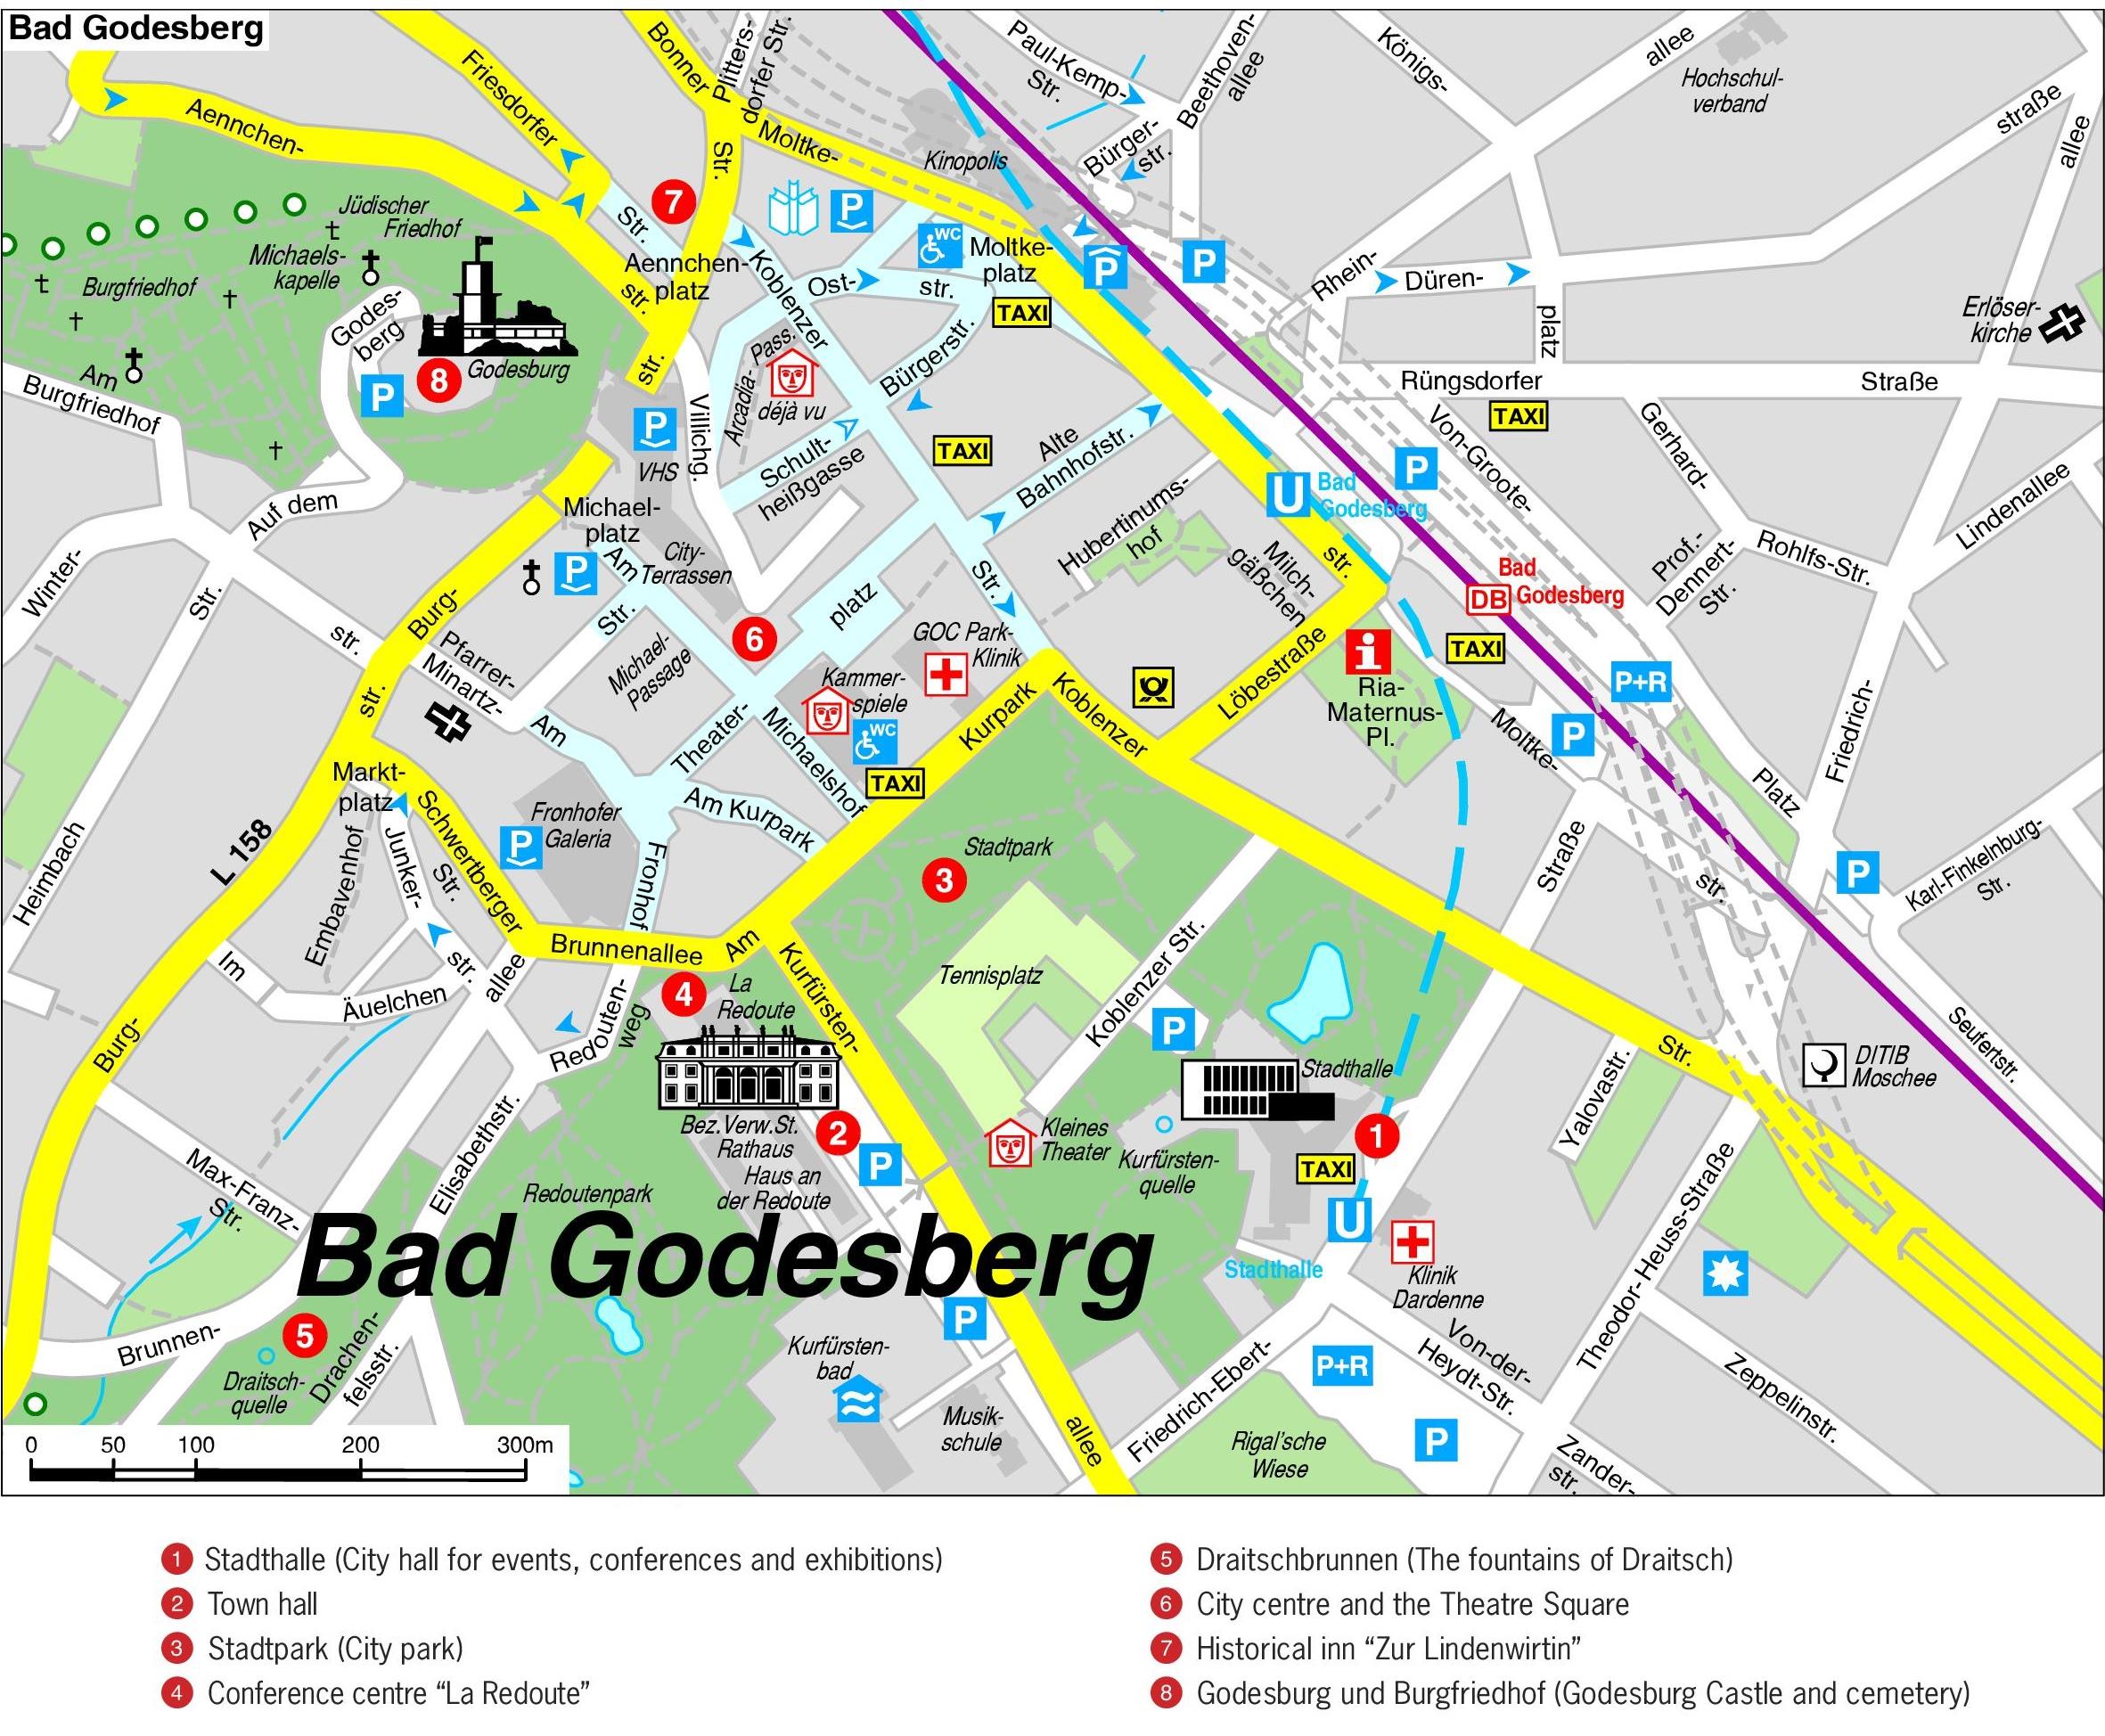 Bonn Bad Godesberg map